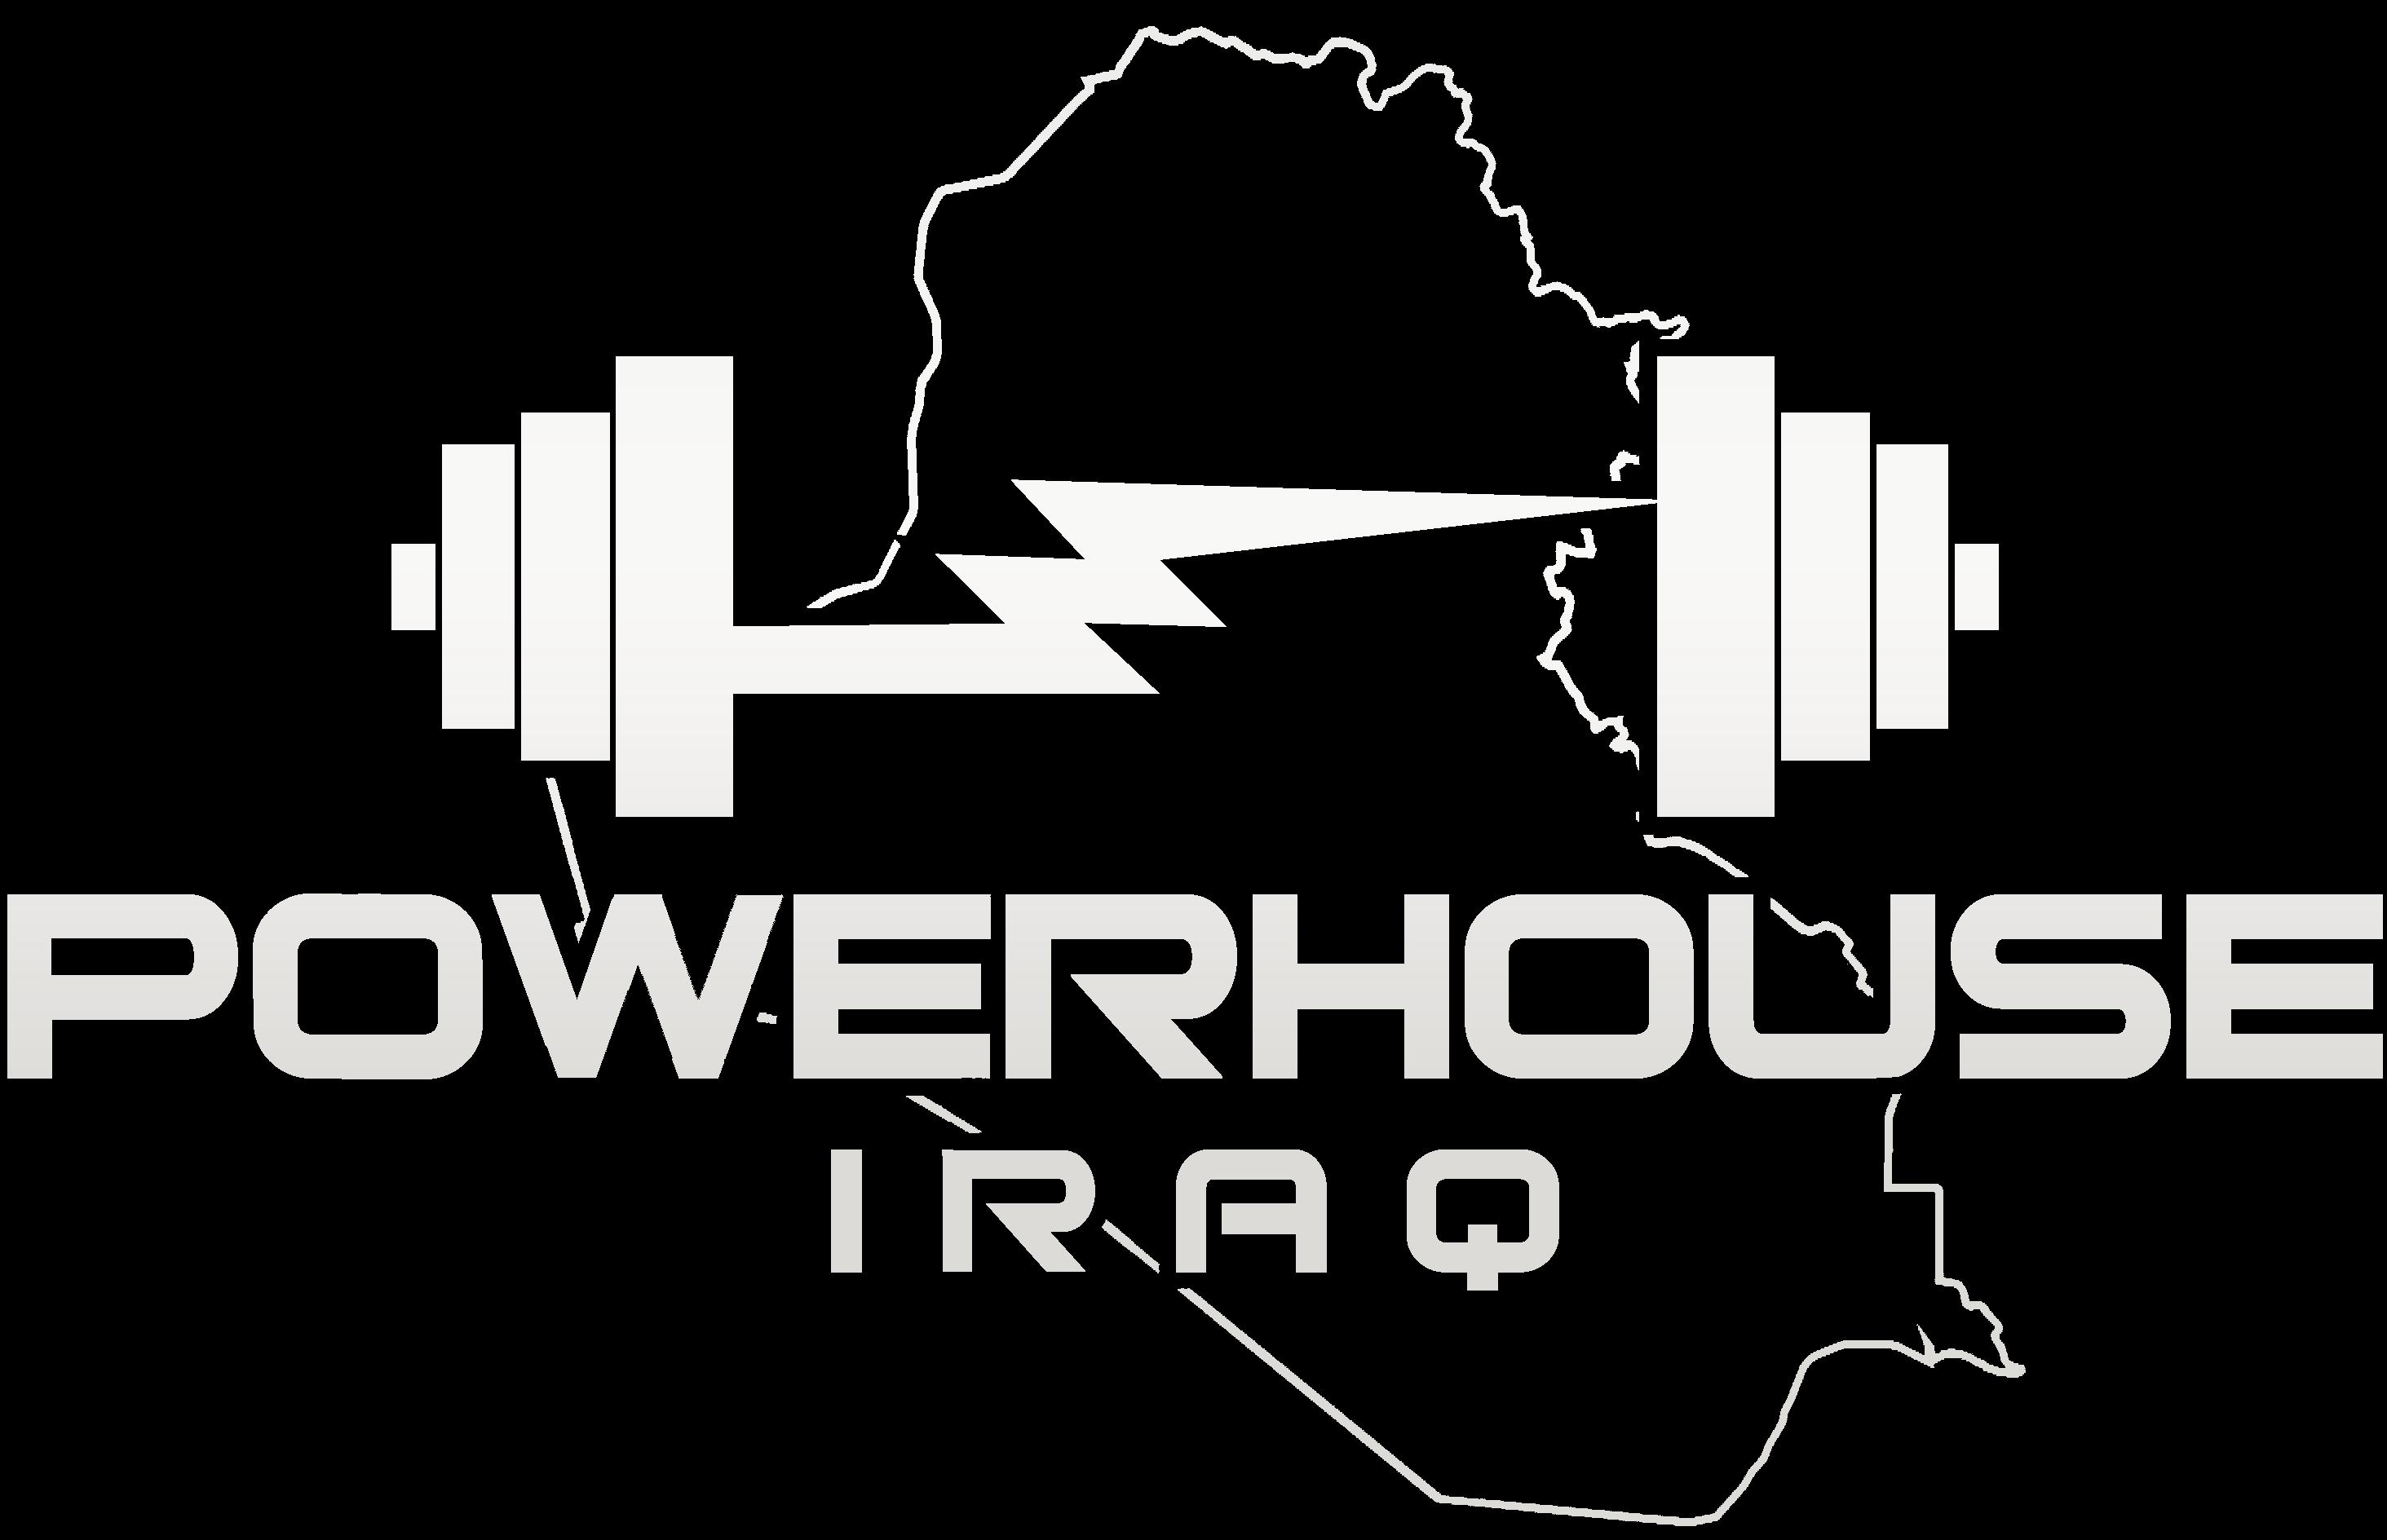 Powerhouseiraq